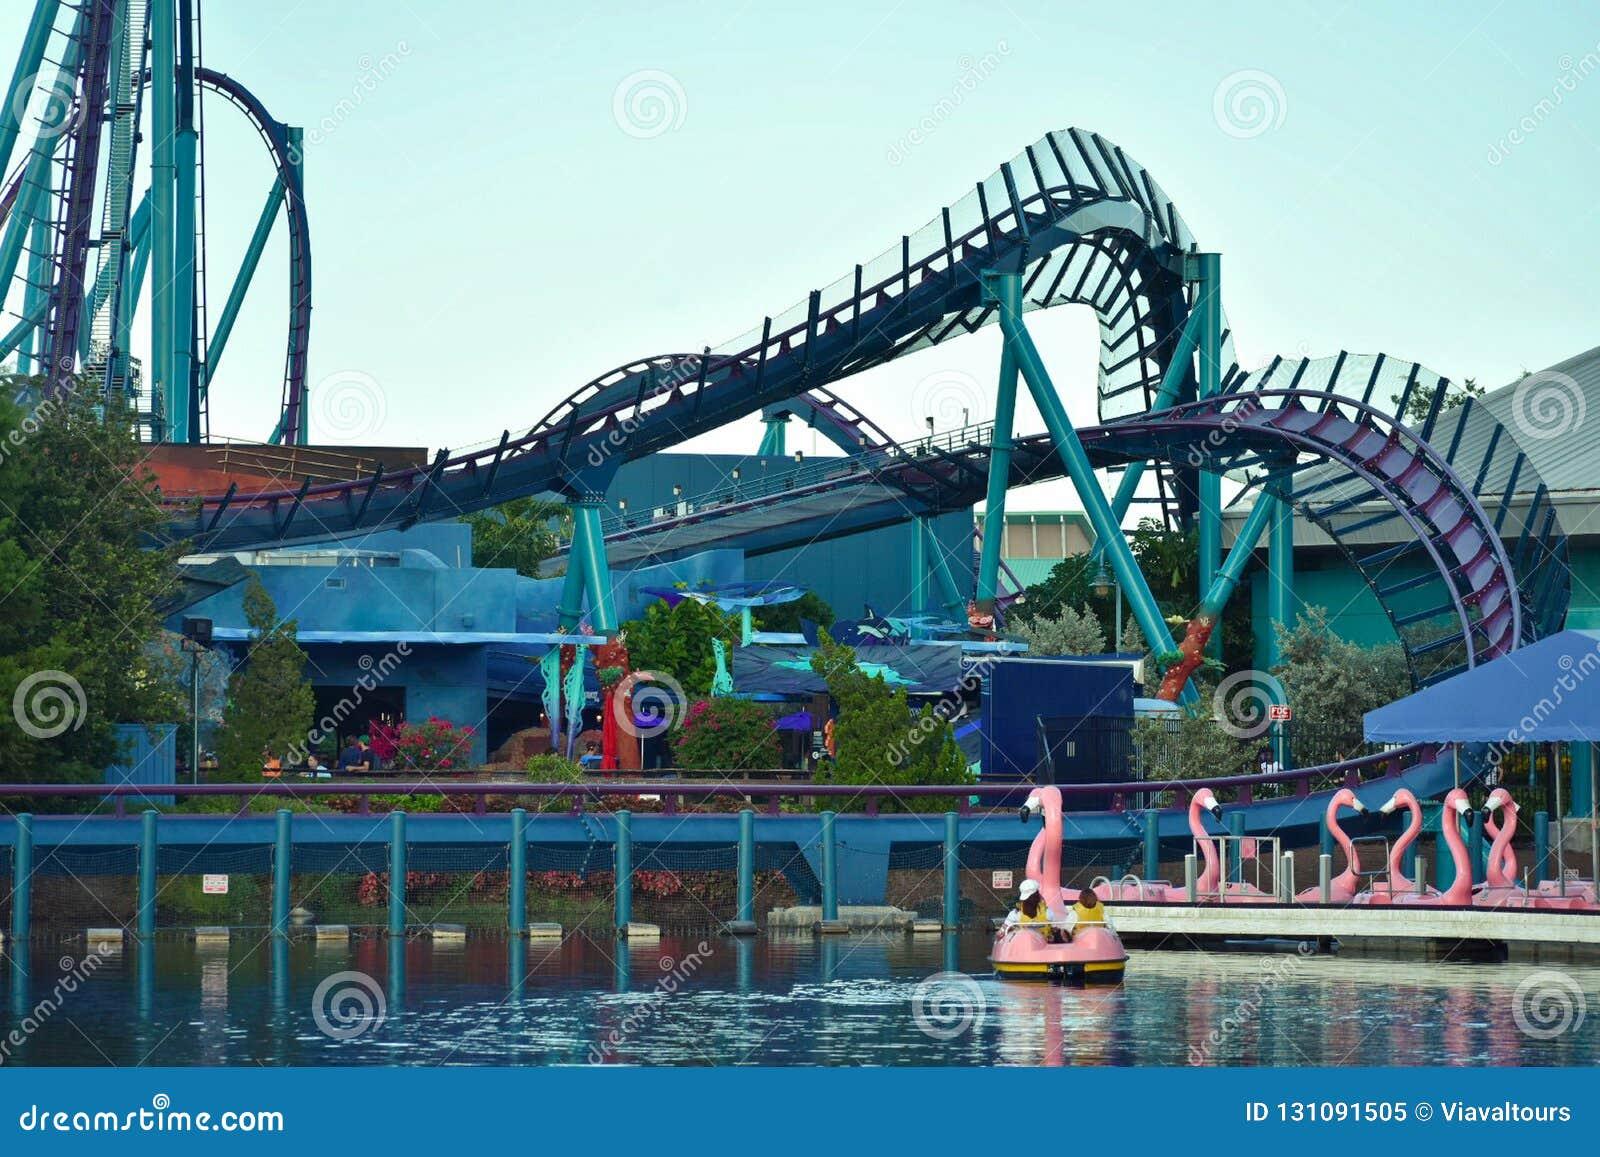 Paddle Flamingo Boat Dock With Mako Rollercoaster Background At Seaworld Theme Park Editorial Image Image Of Circle Coaster 131091505